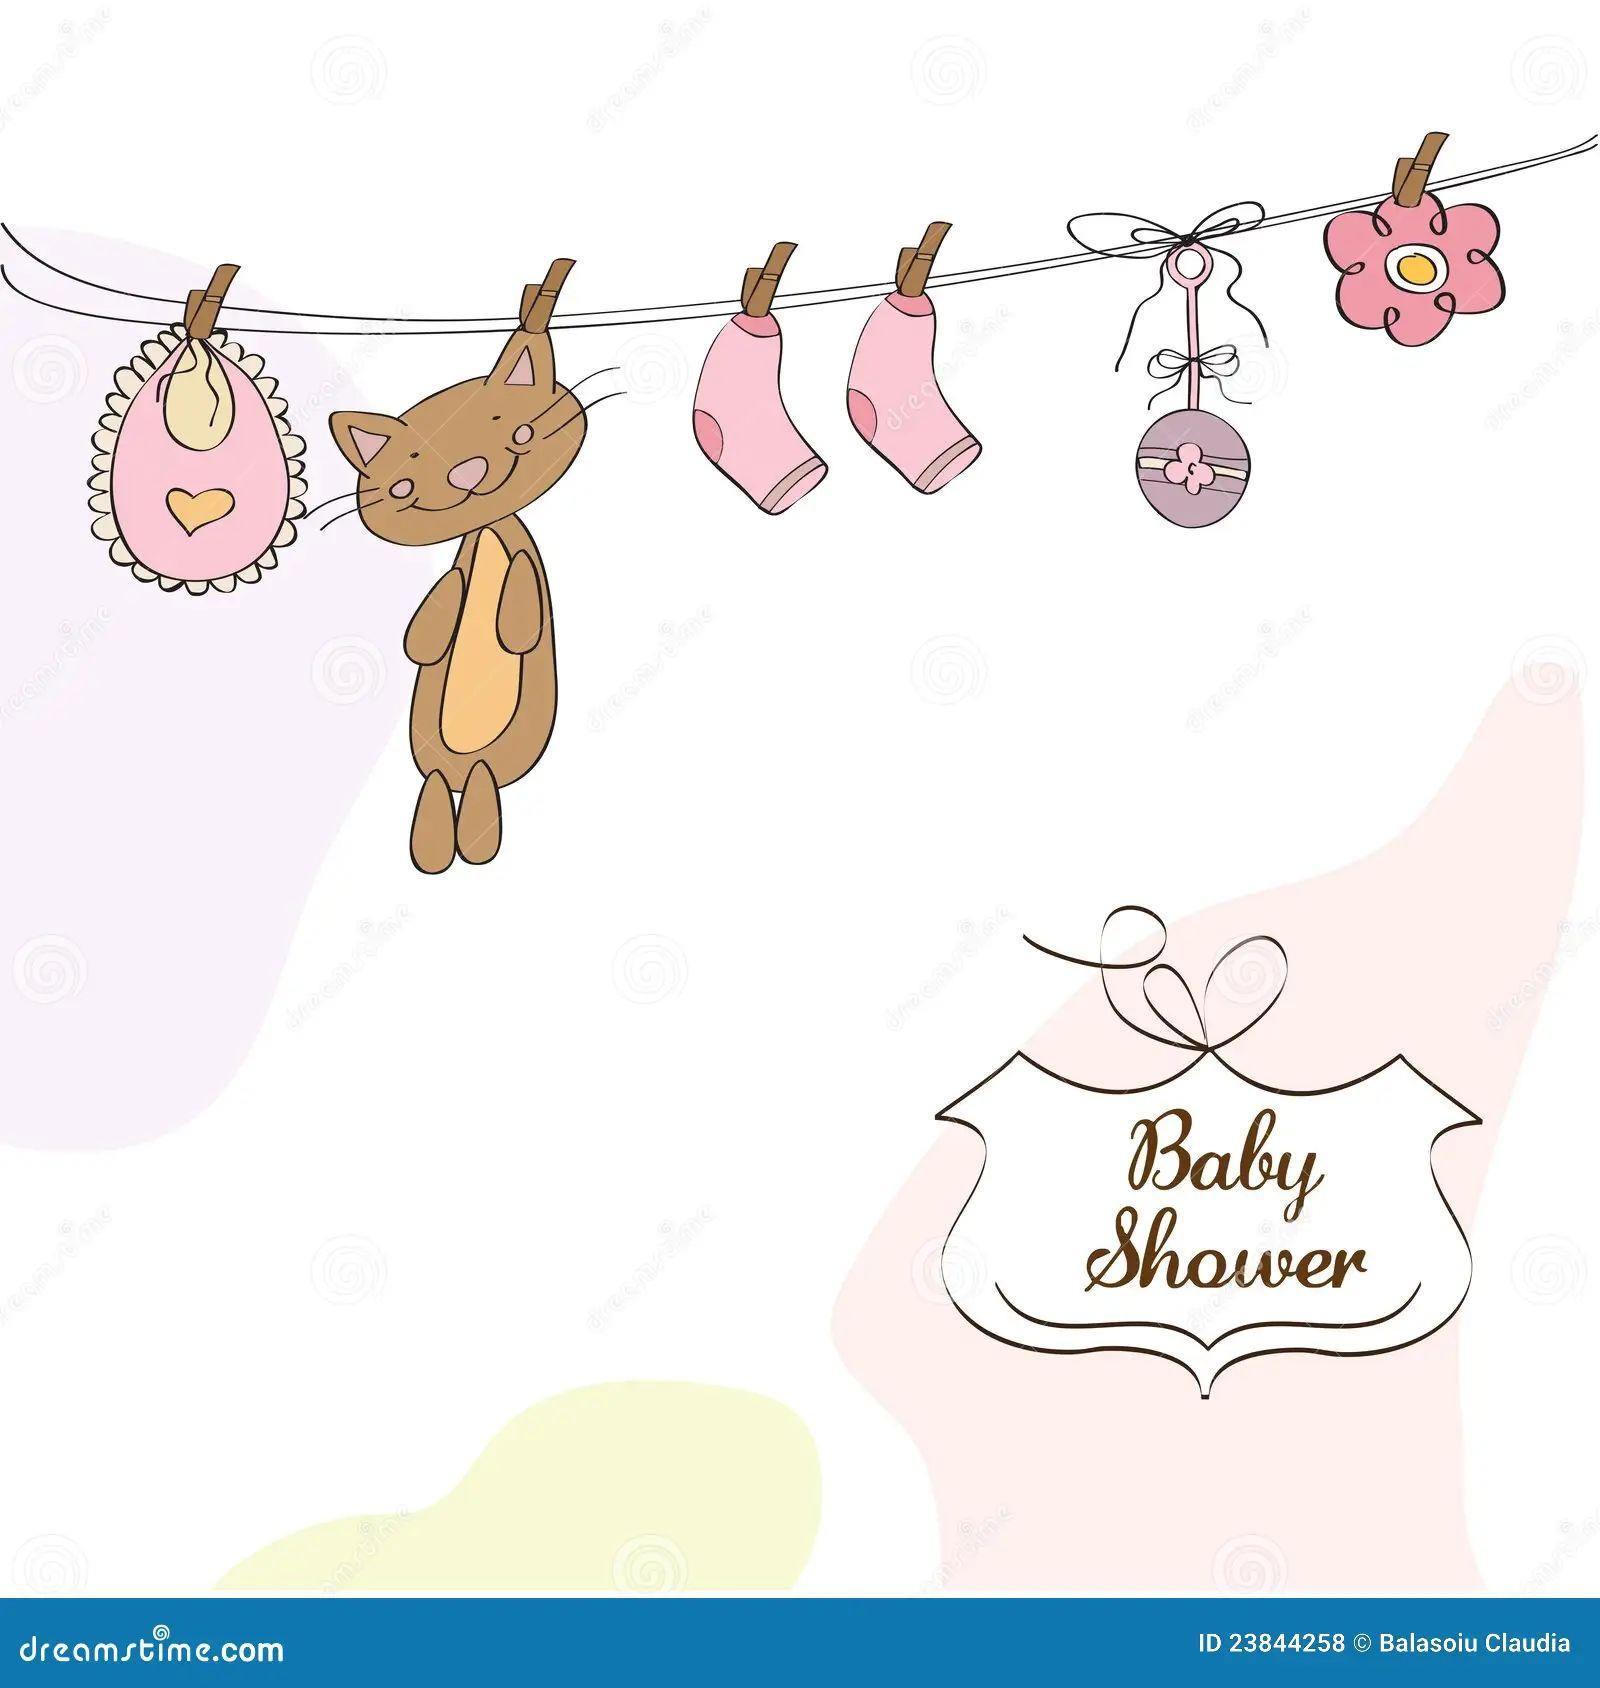 free downloads baby shower invitations